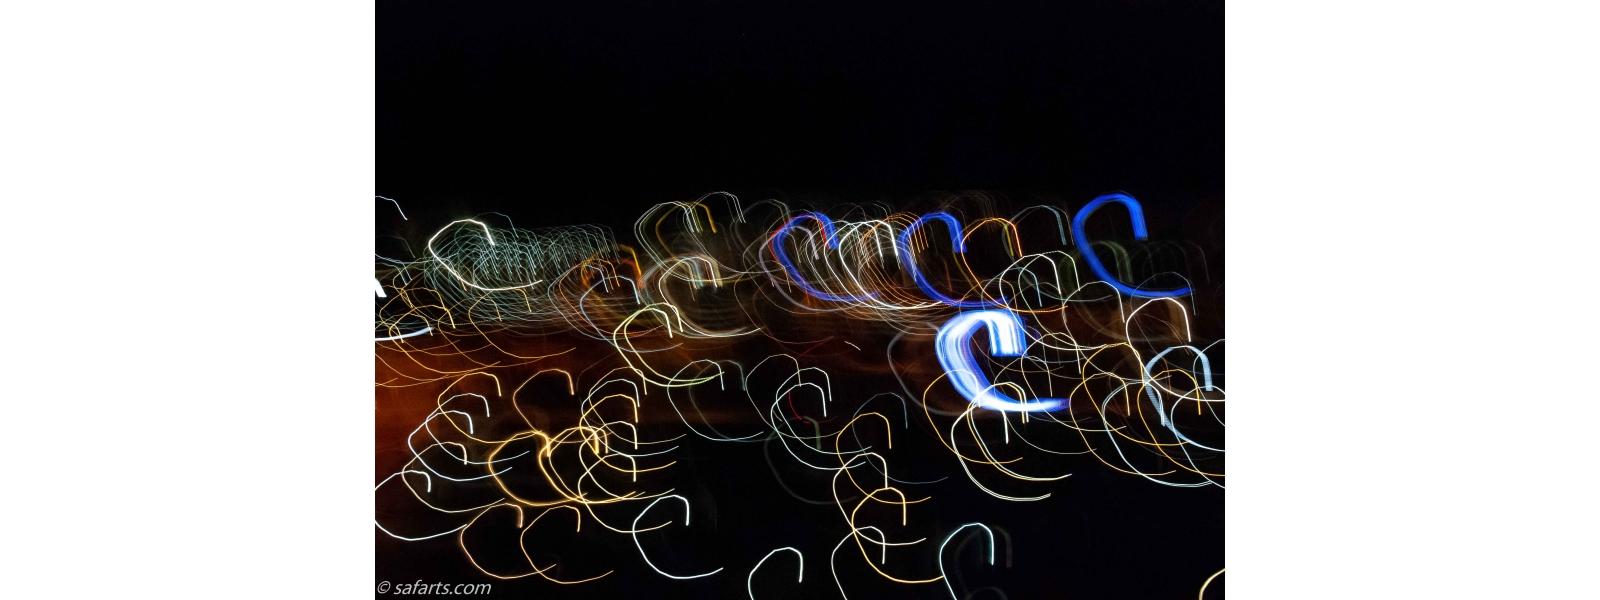 Teaser_Bild_Silvia-2.jpg